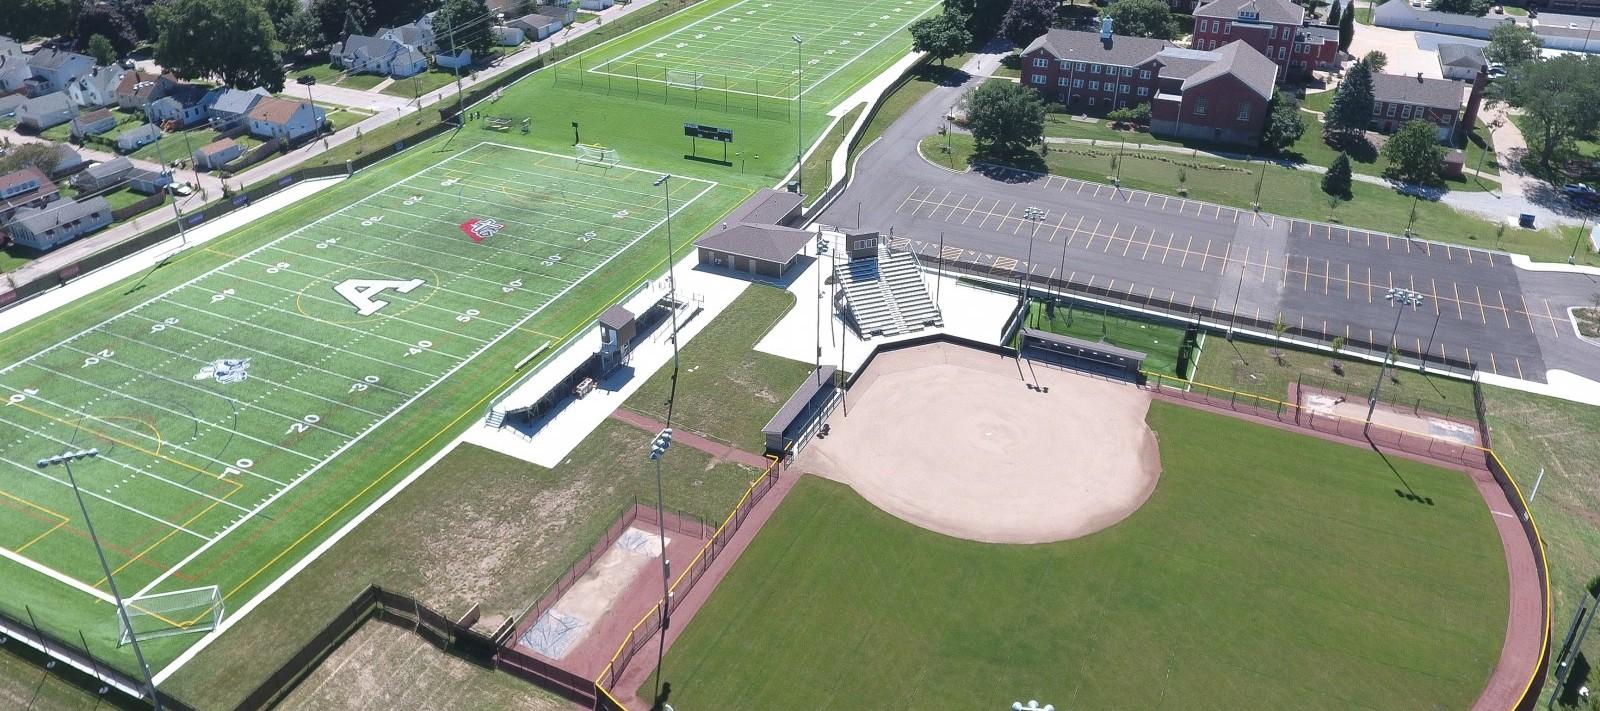 Aerial view of Assumption baseball field